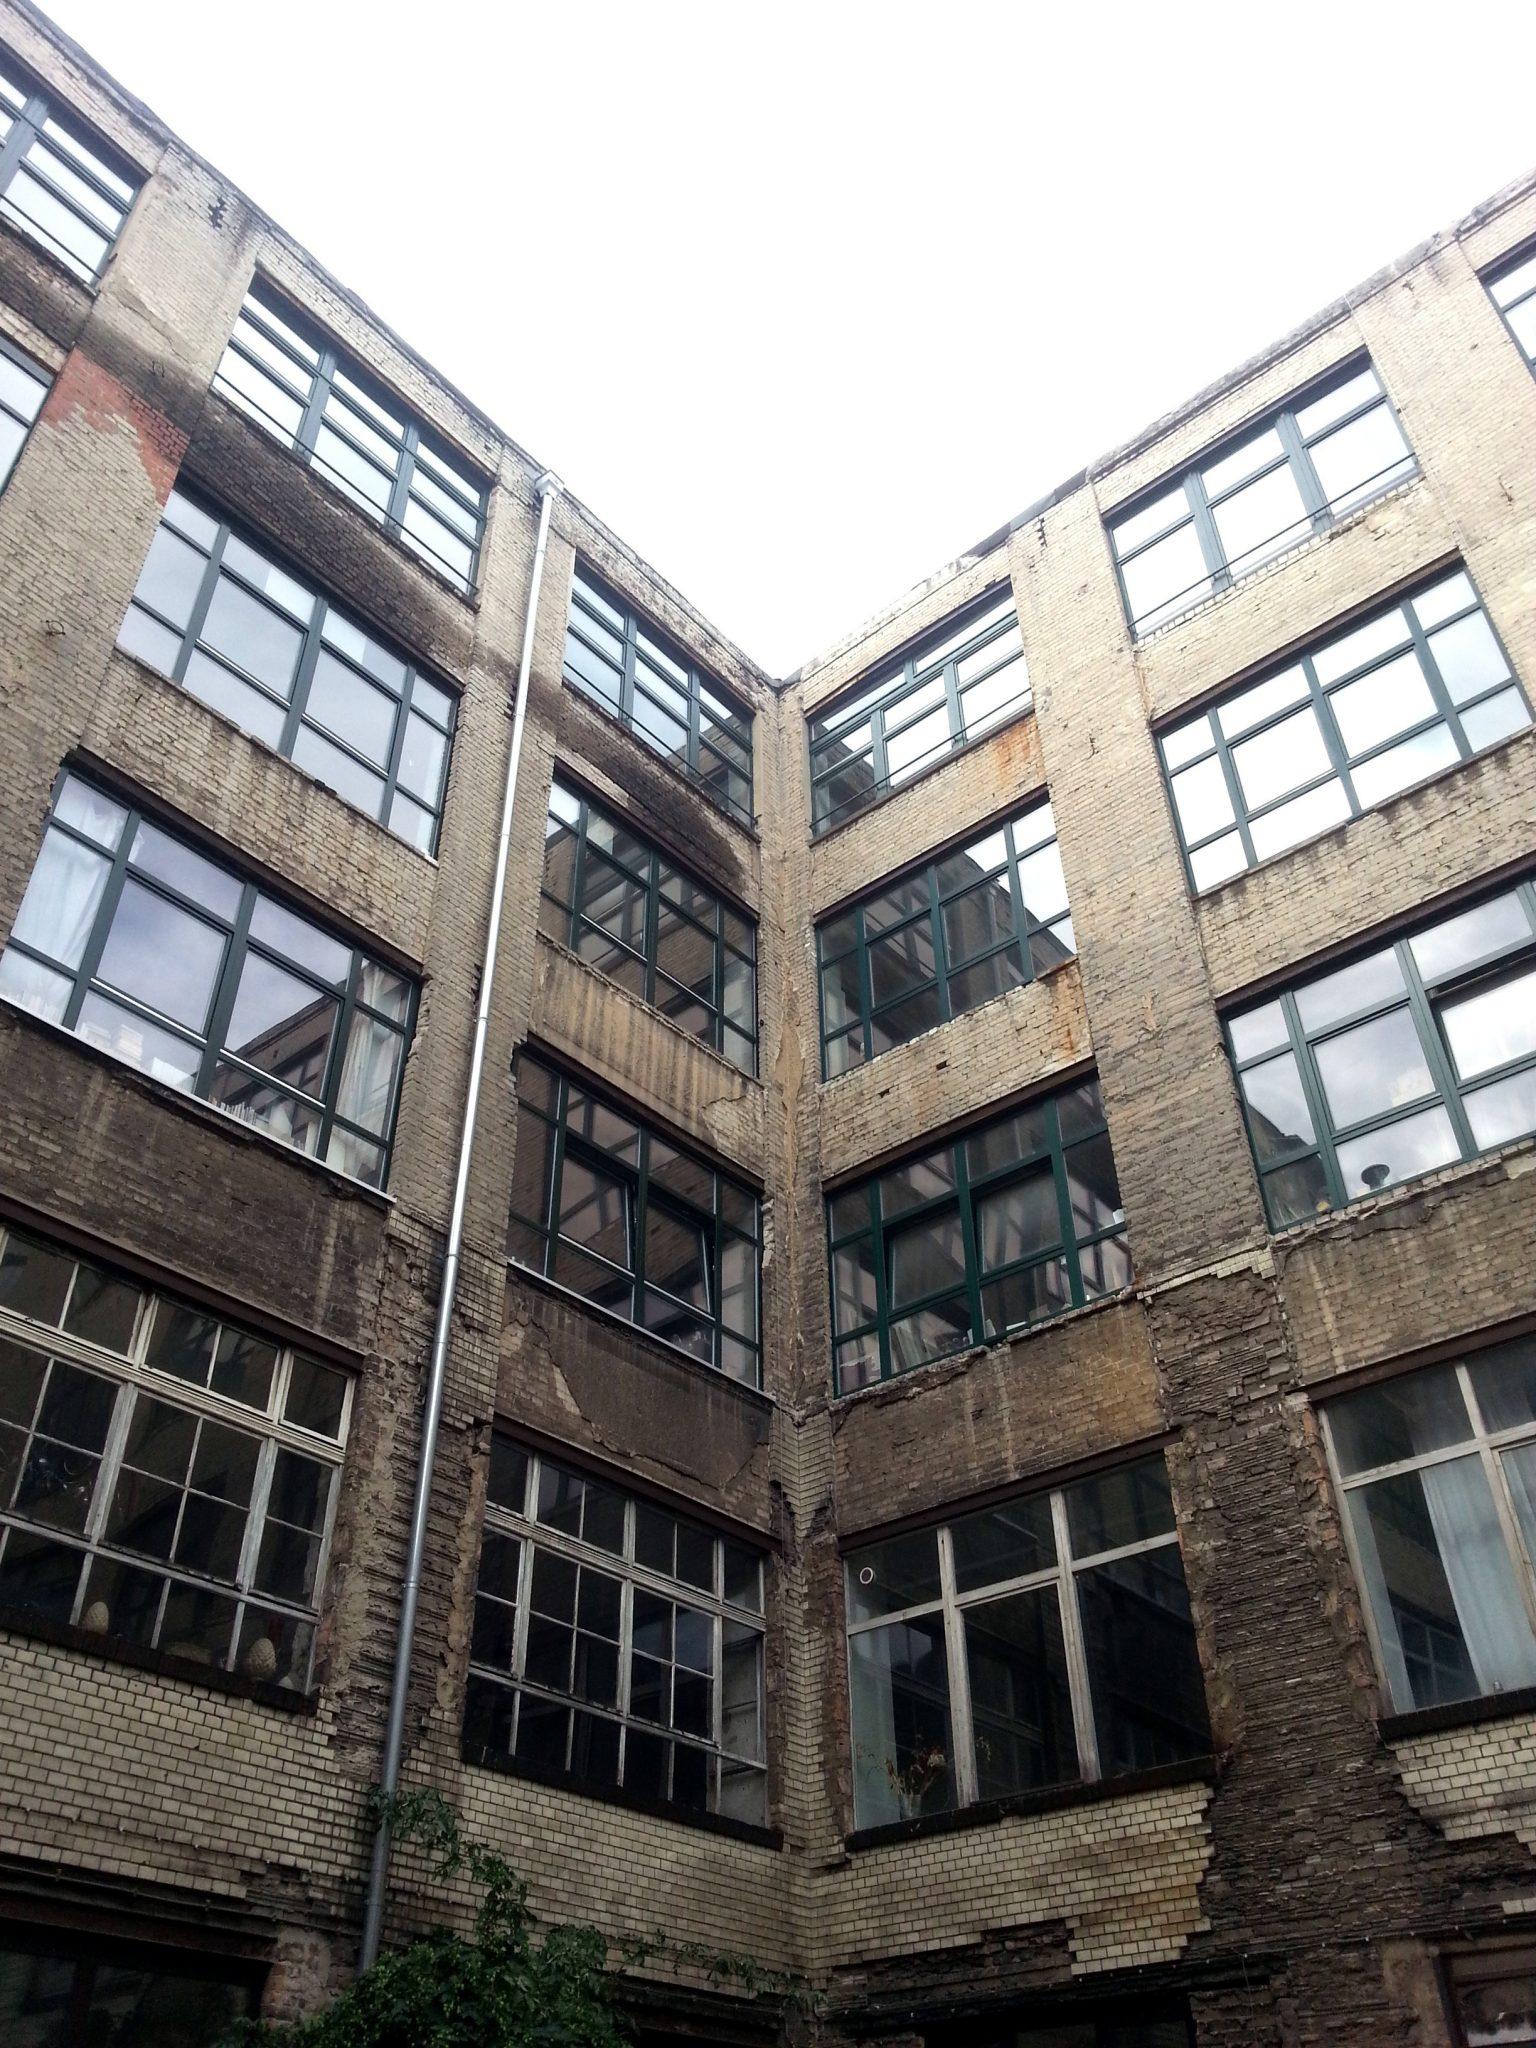 Hof Gerichtstraße